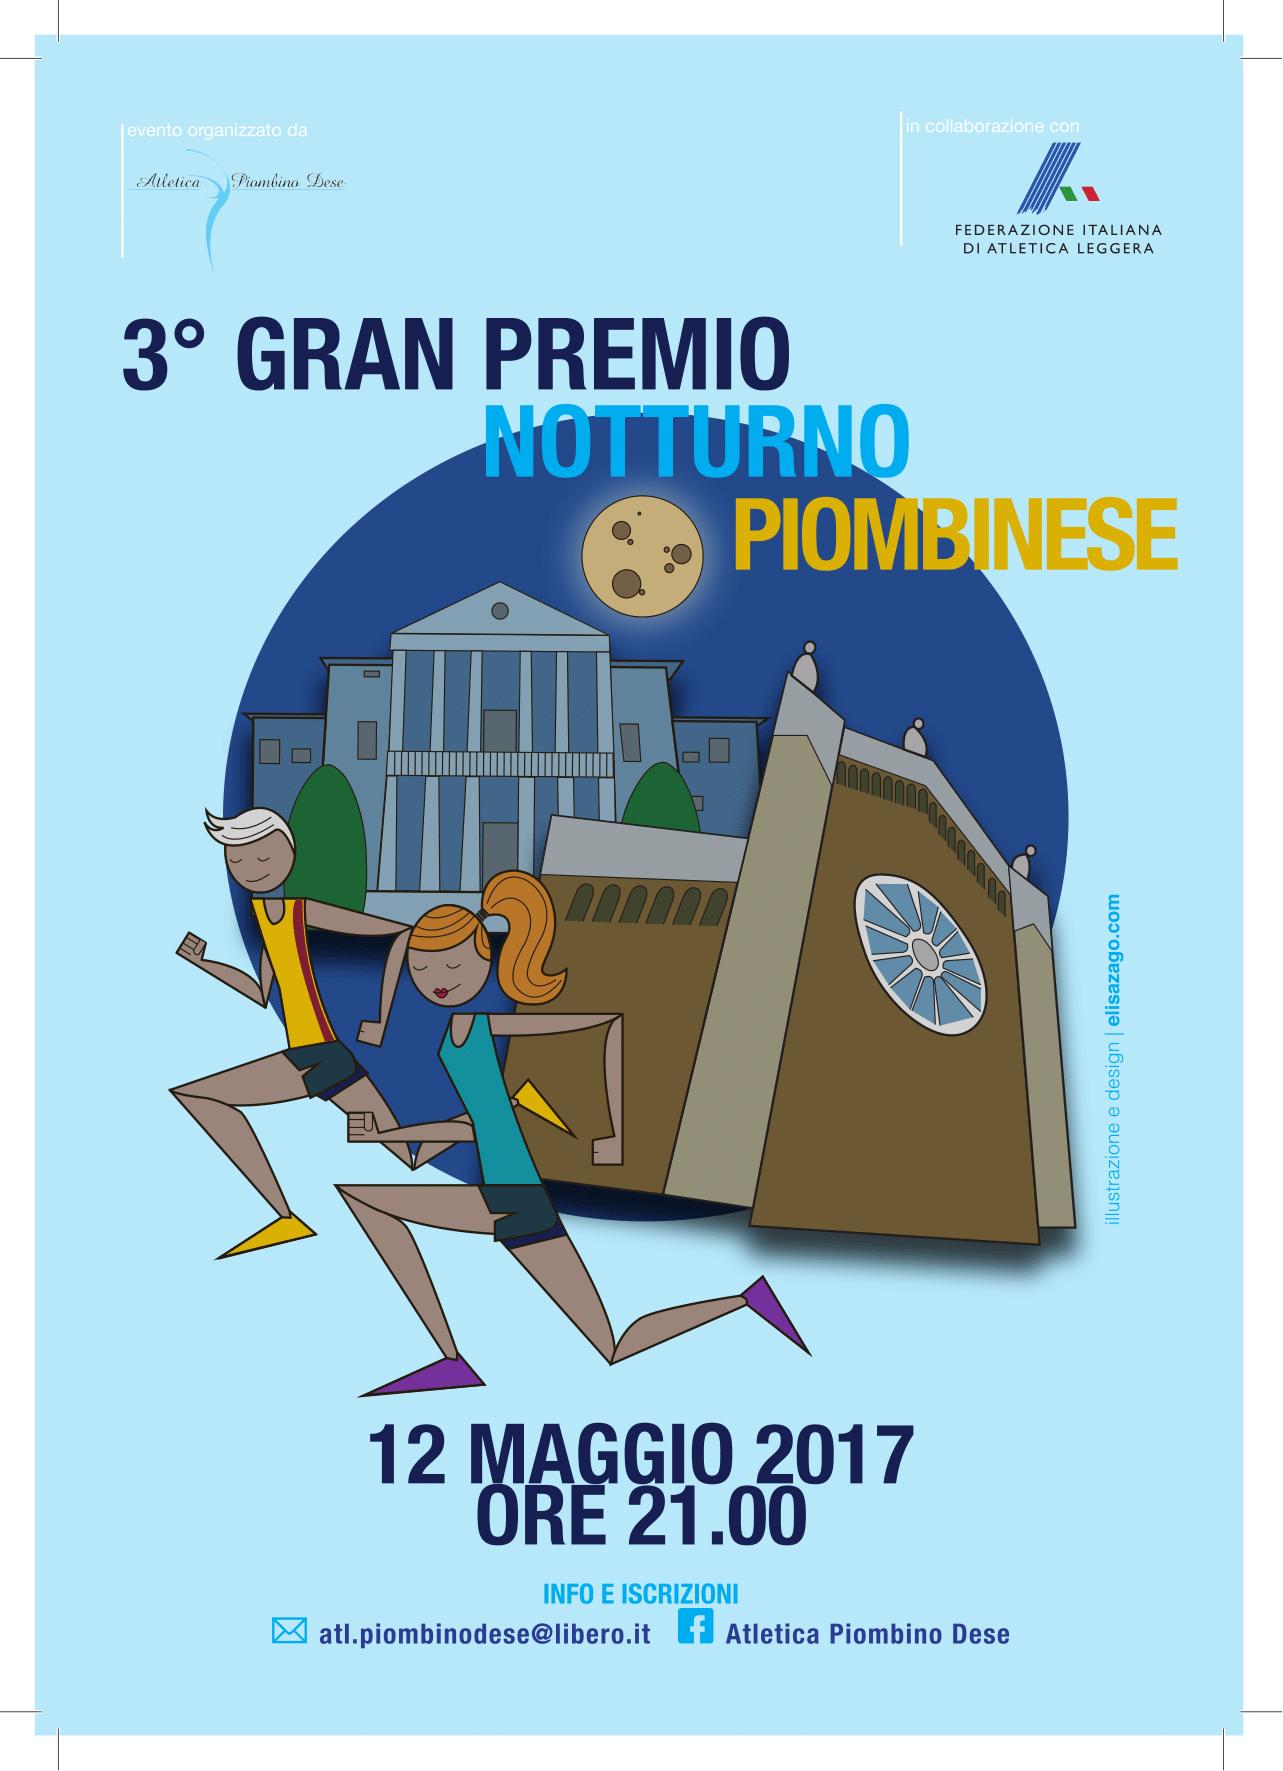 III° GRAN PREMIO NOTTURNO PIOMBINESE - Bimbi in Fiore